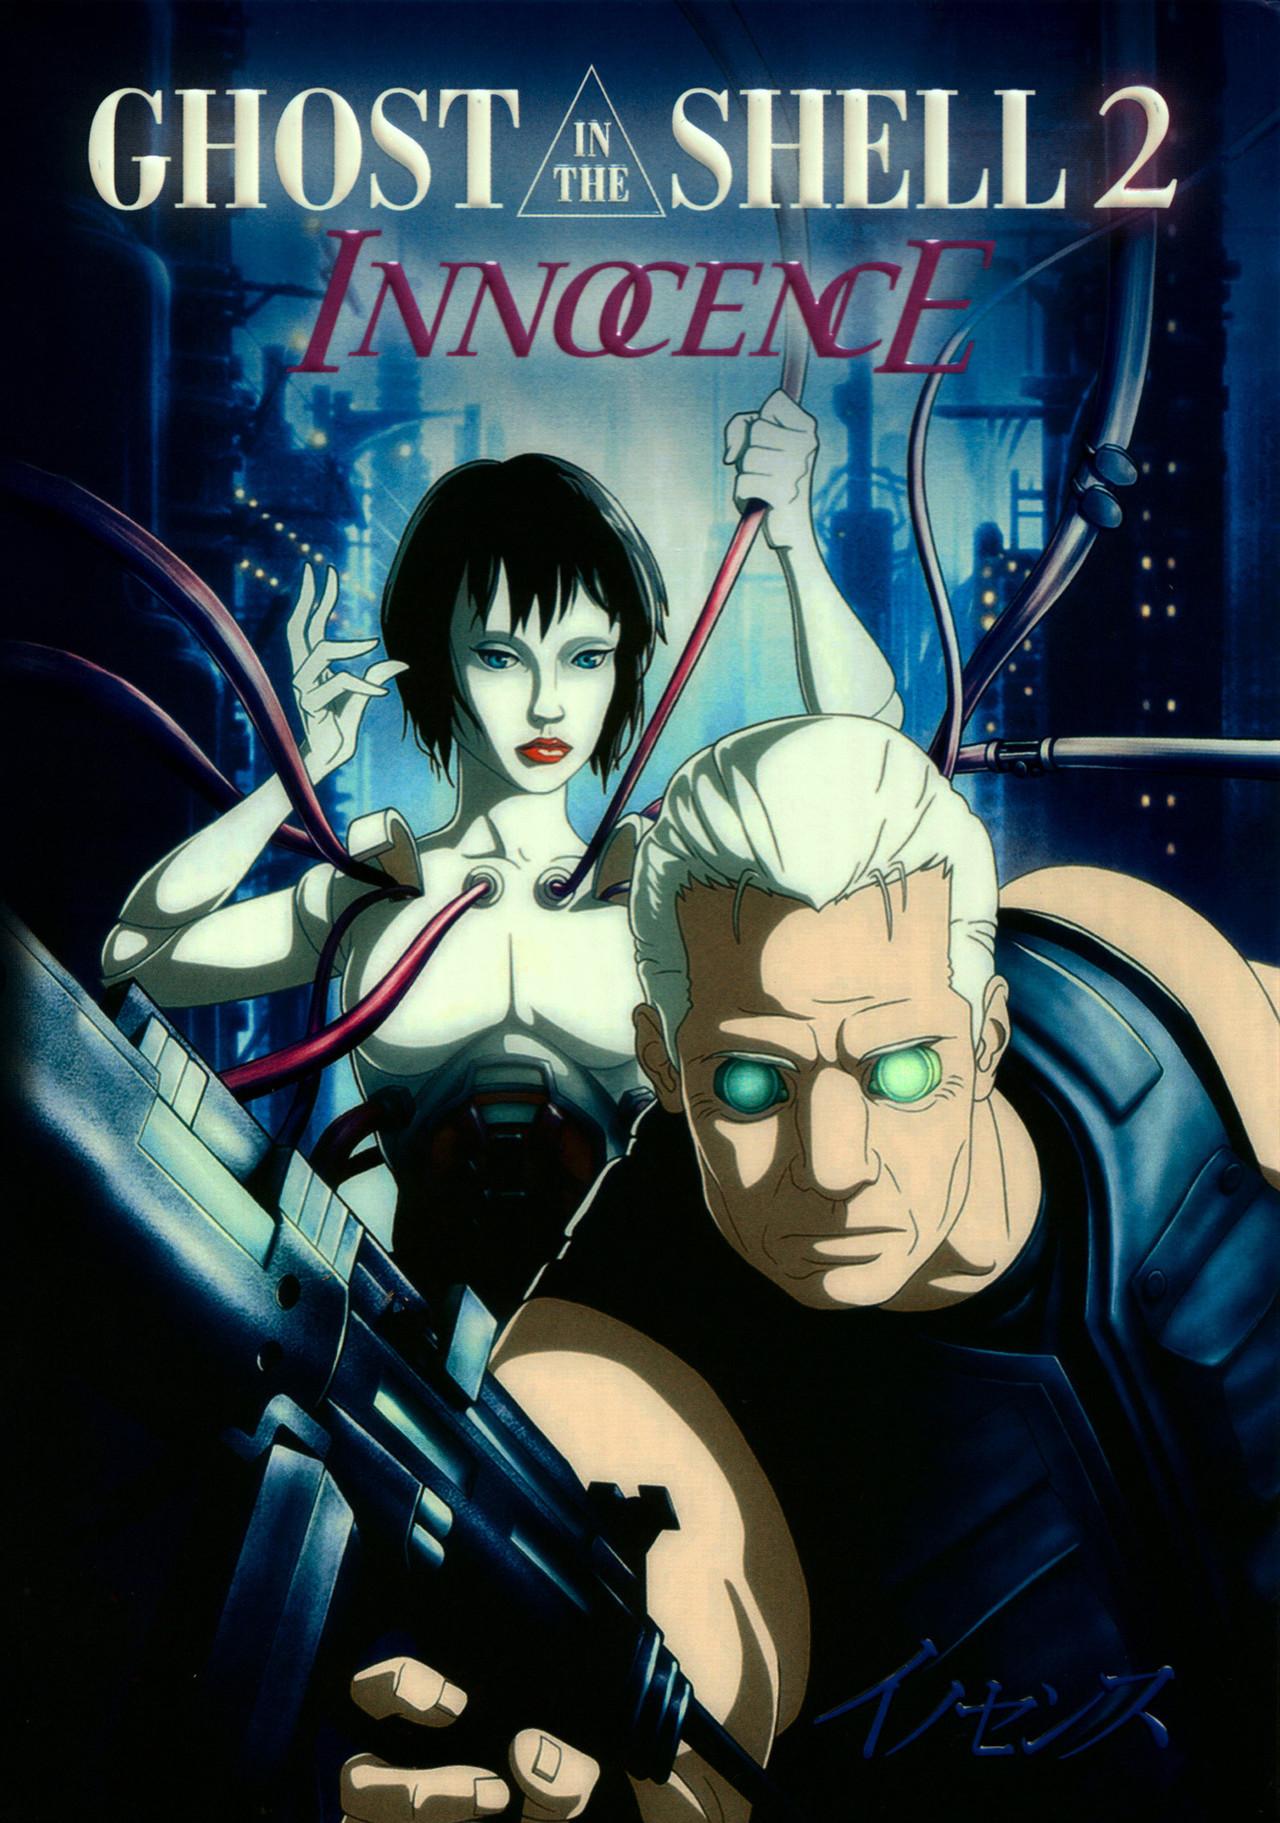 Ghost in the Shell 2: Innocence kapak